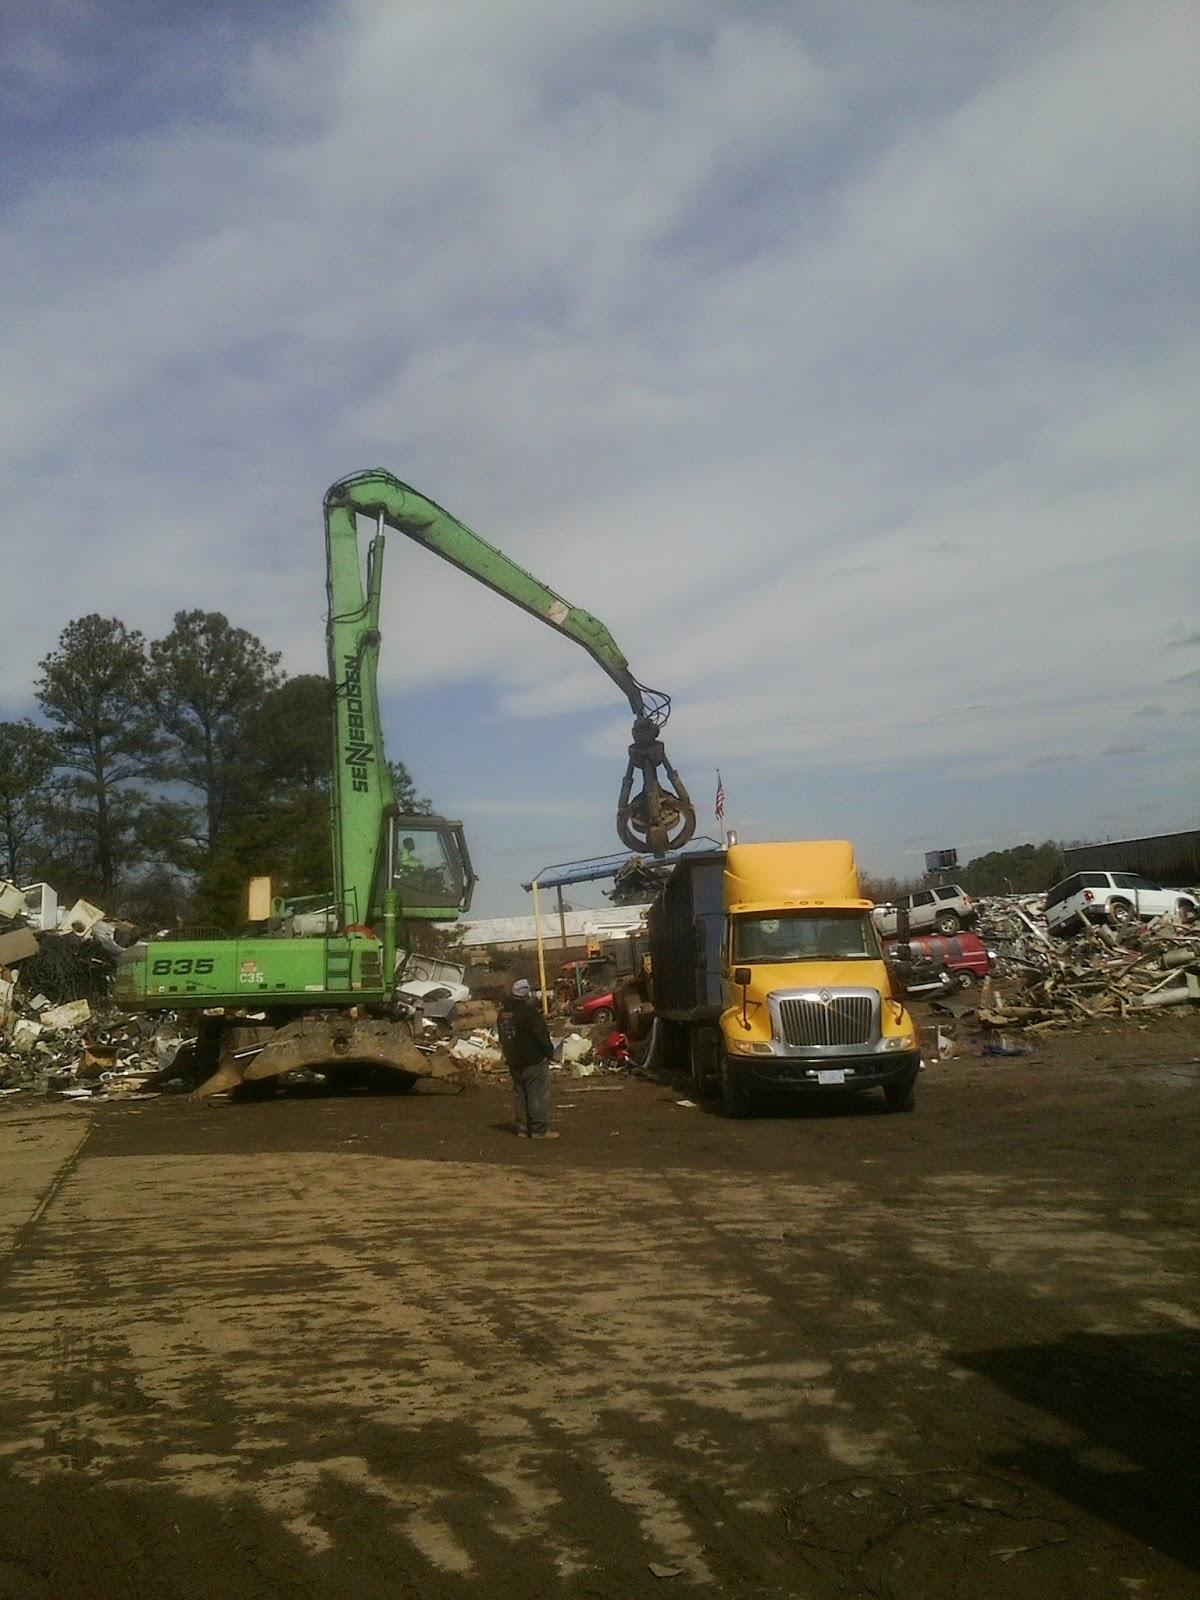 Scrap Metal Goldsboro, NC, Junk Cars, Salvage, Yard, Recycling ...